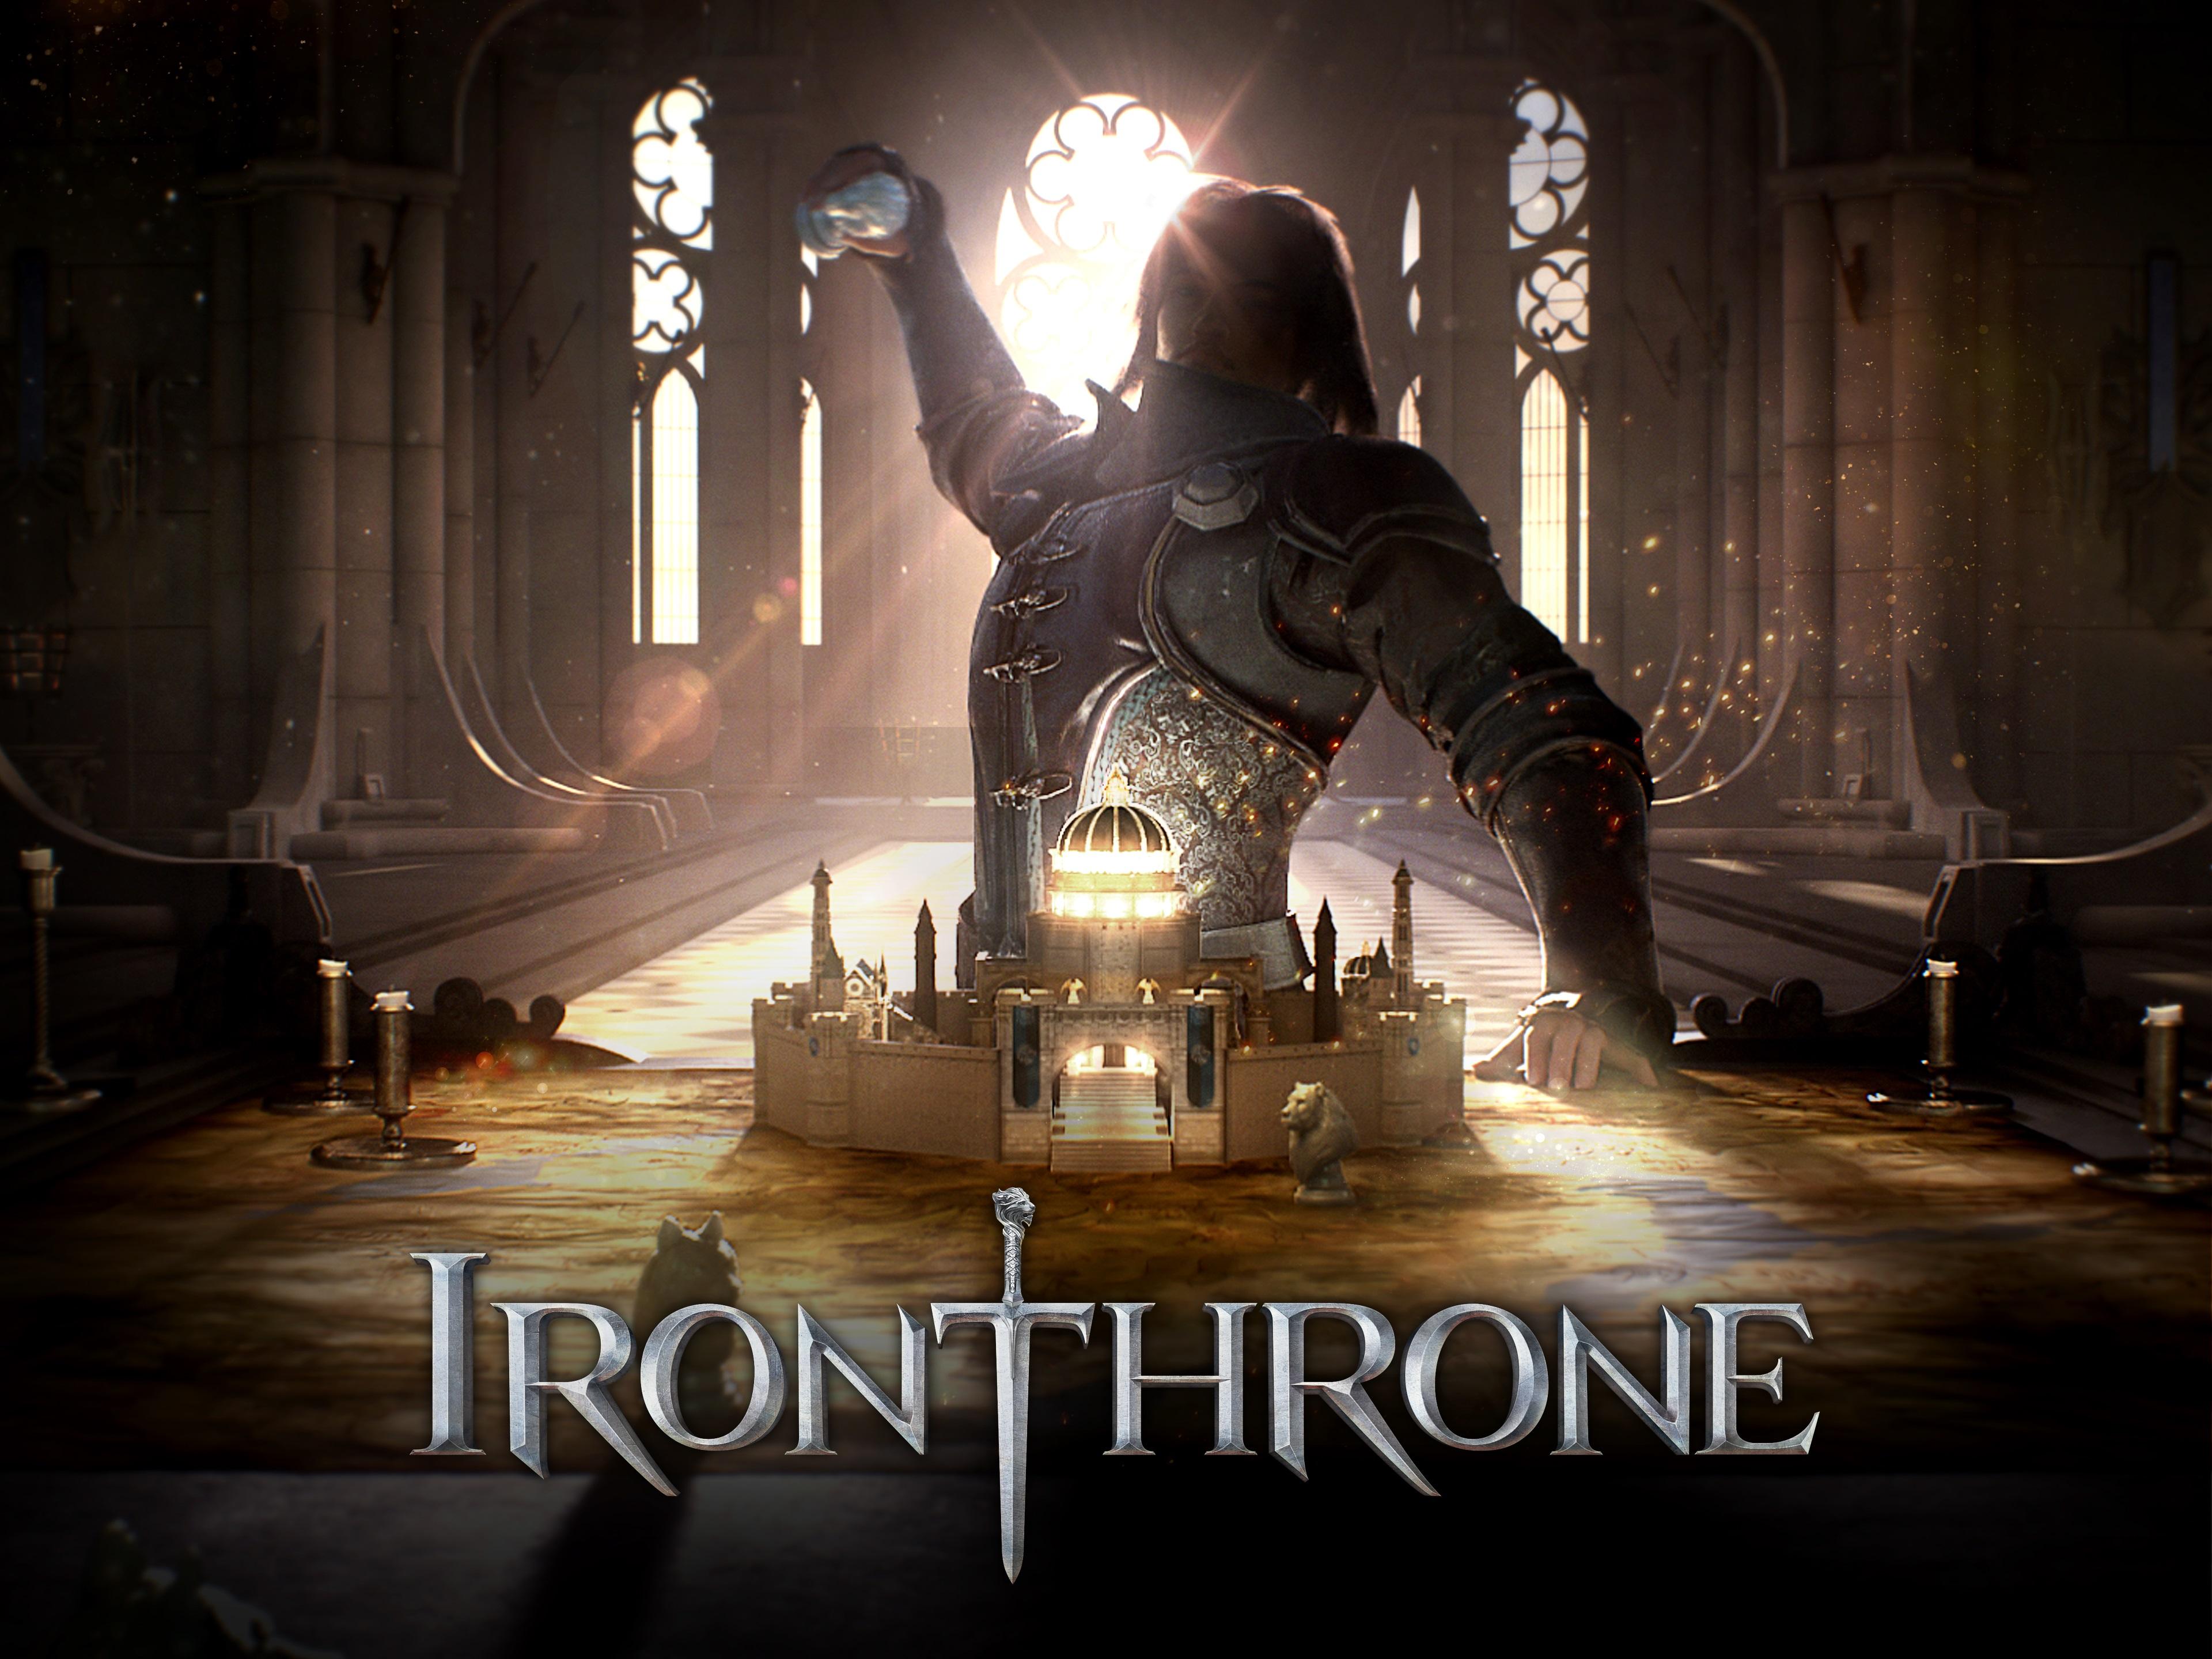 Beginner's guide to Netmarble's Iron Throne